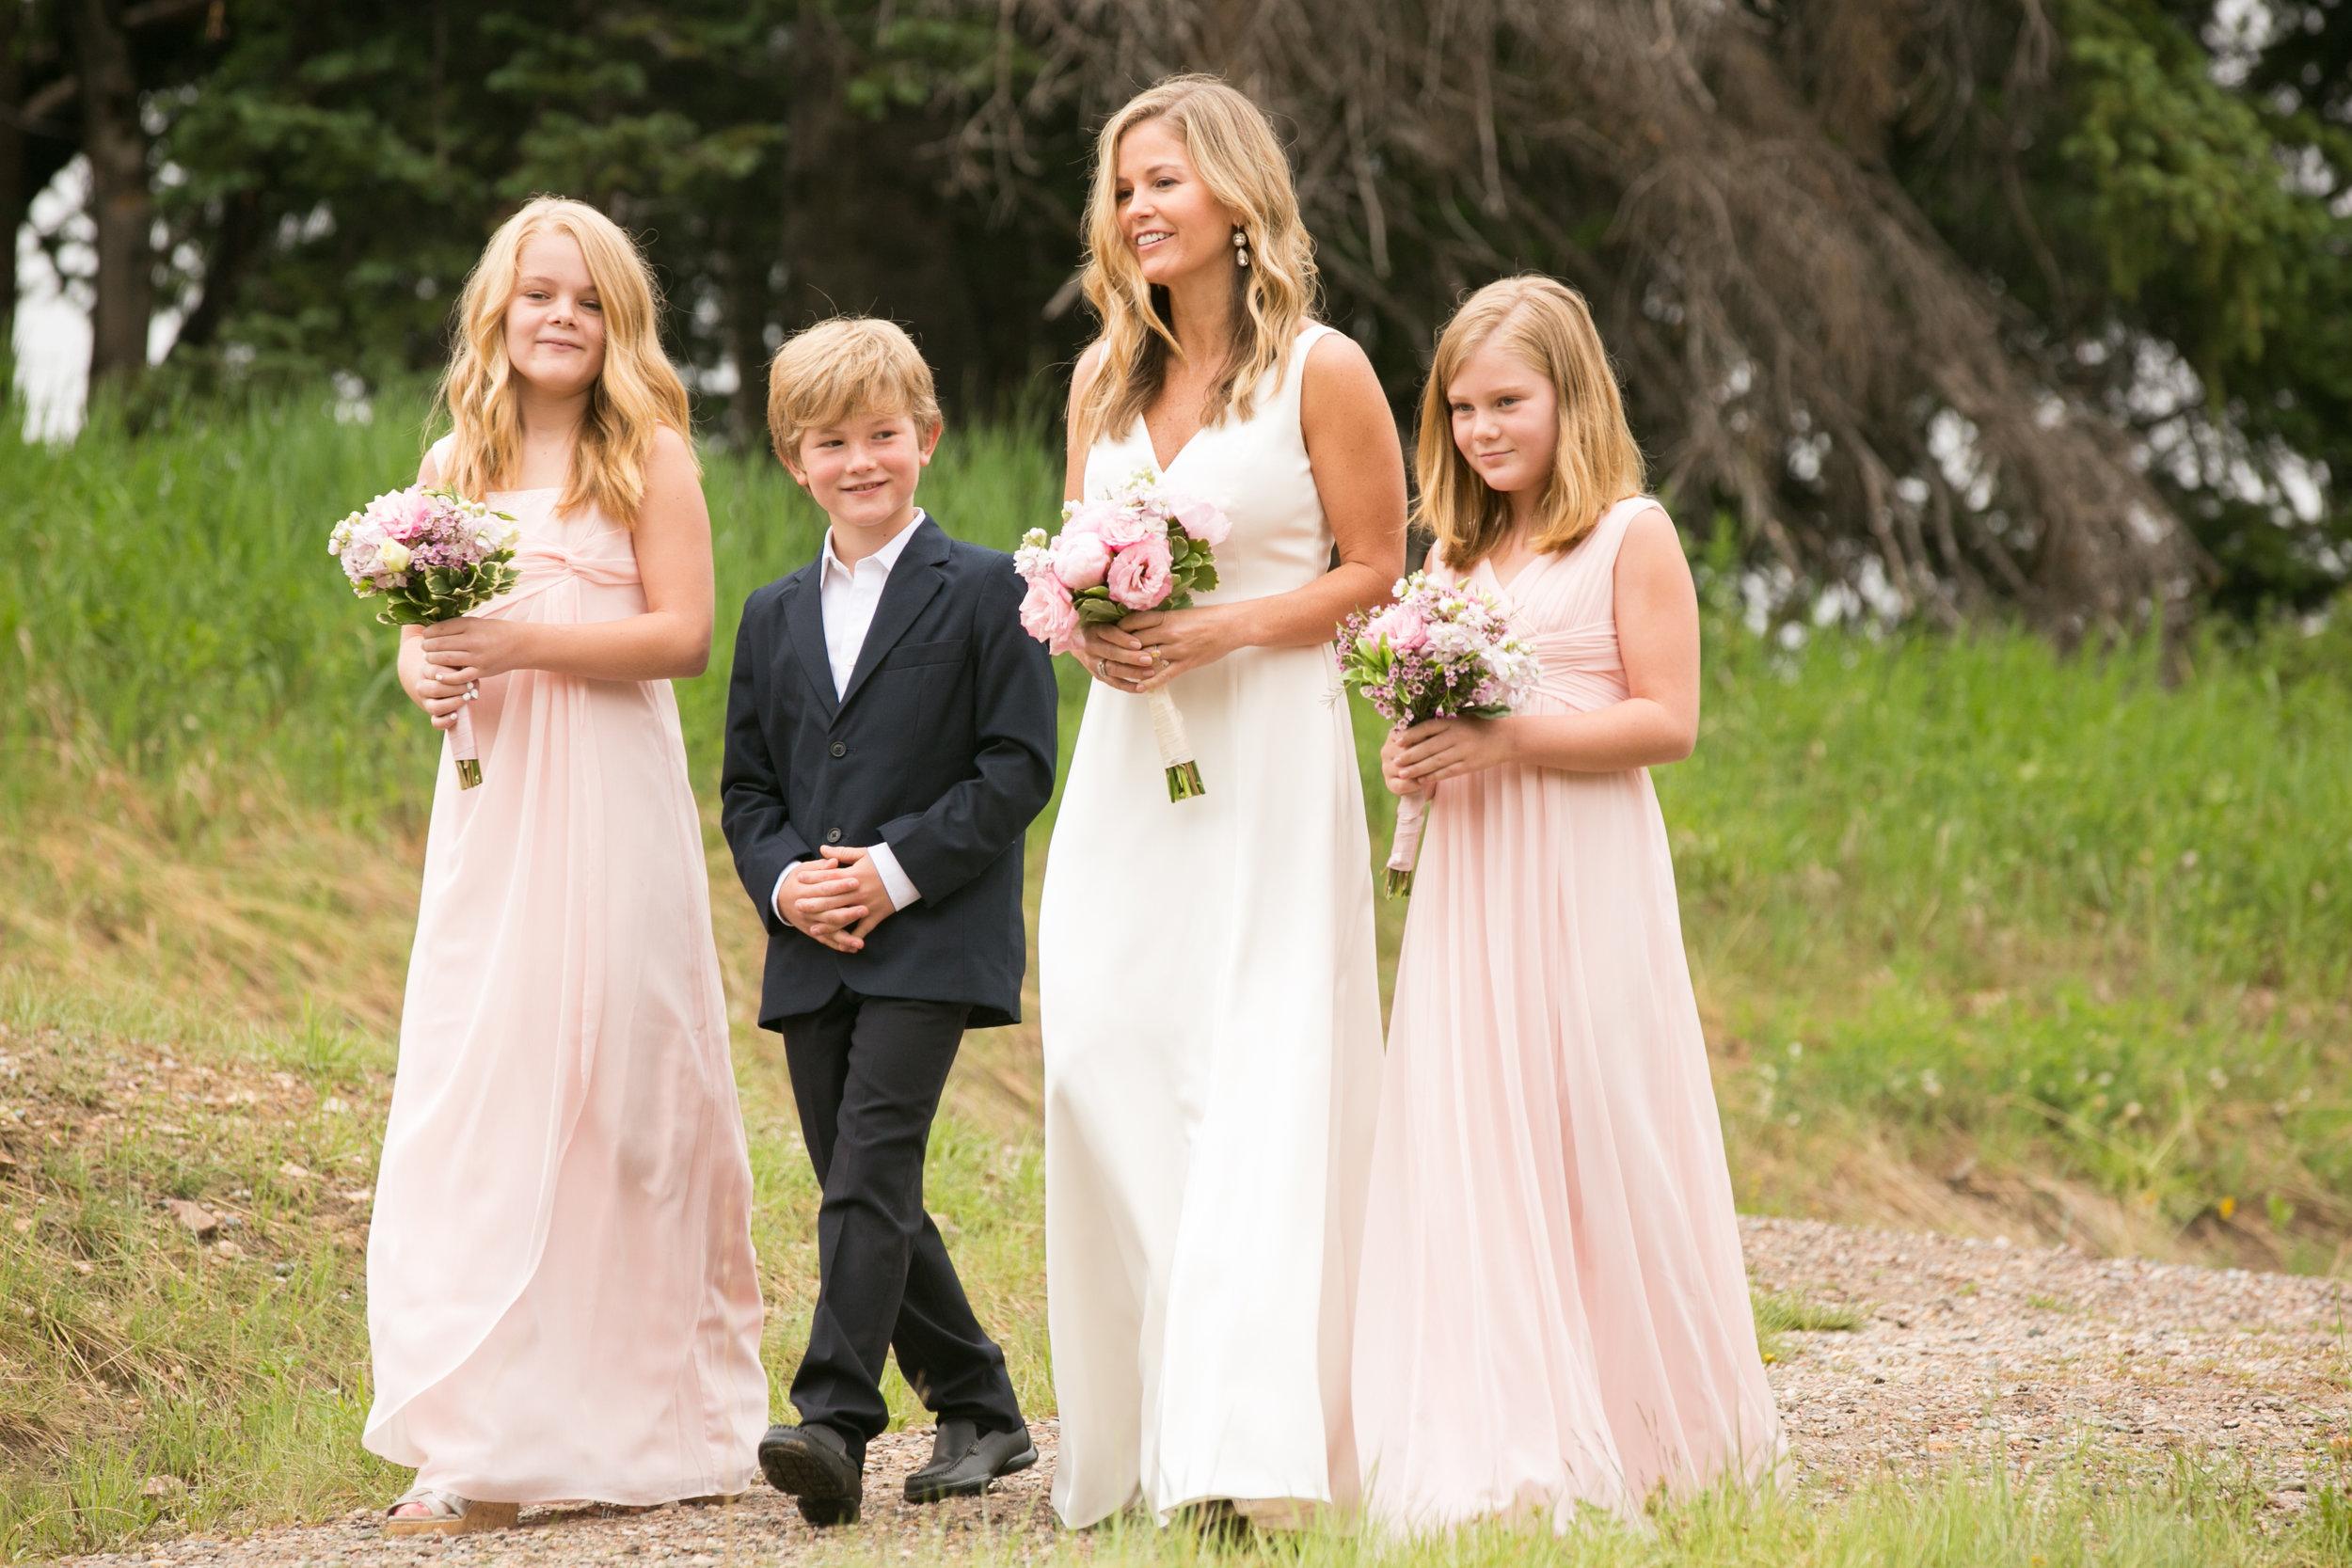 wedding-information-beaver-creek-axelphoto.jpg